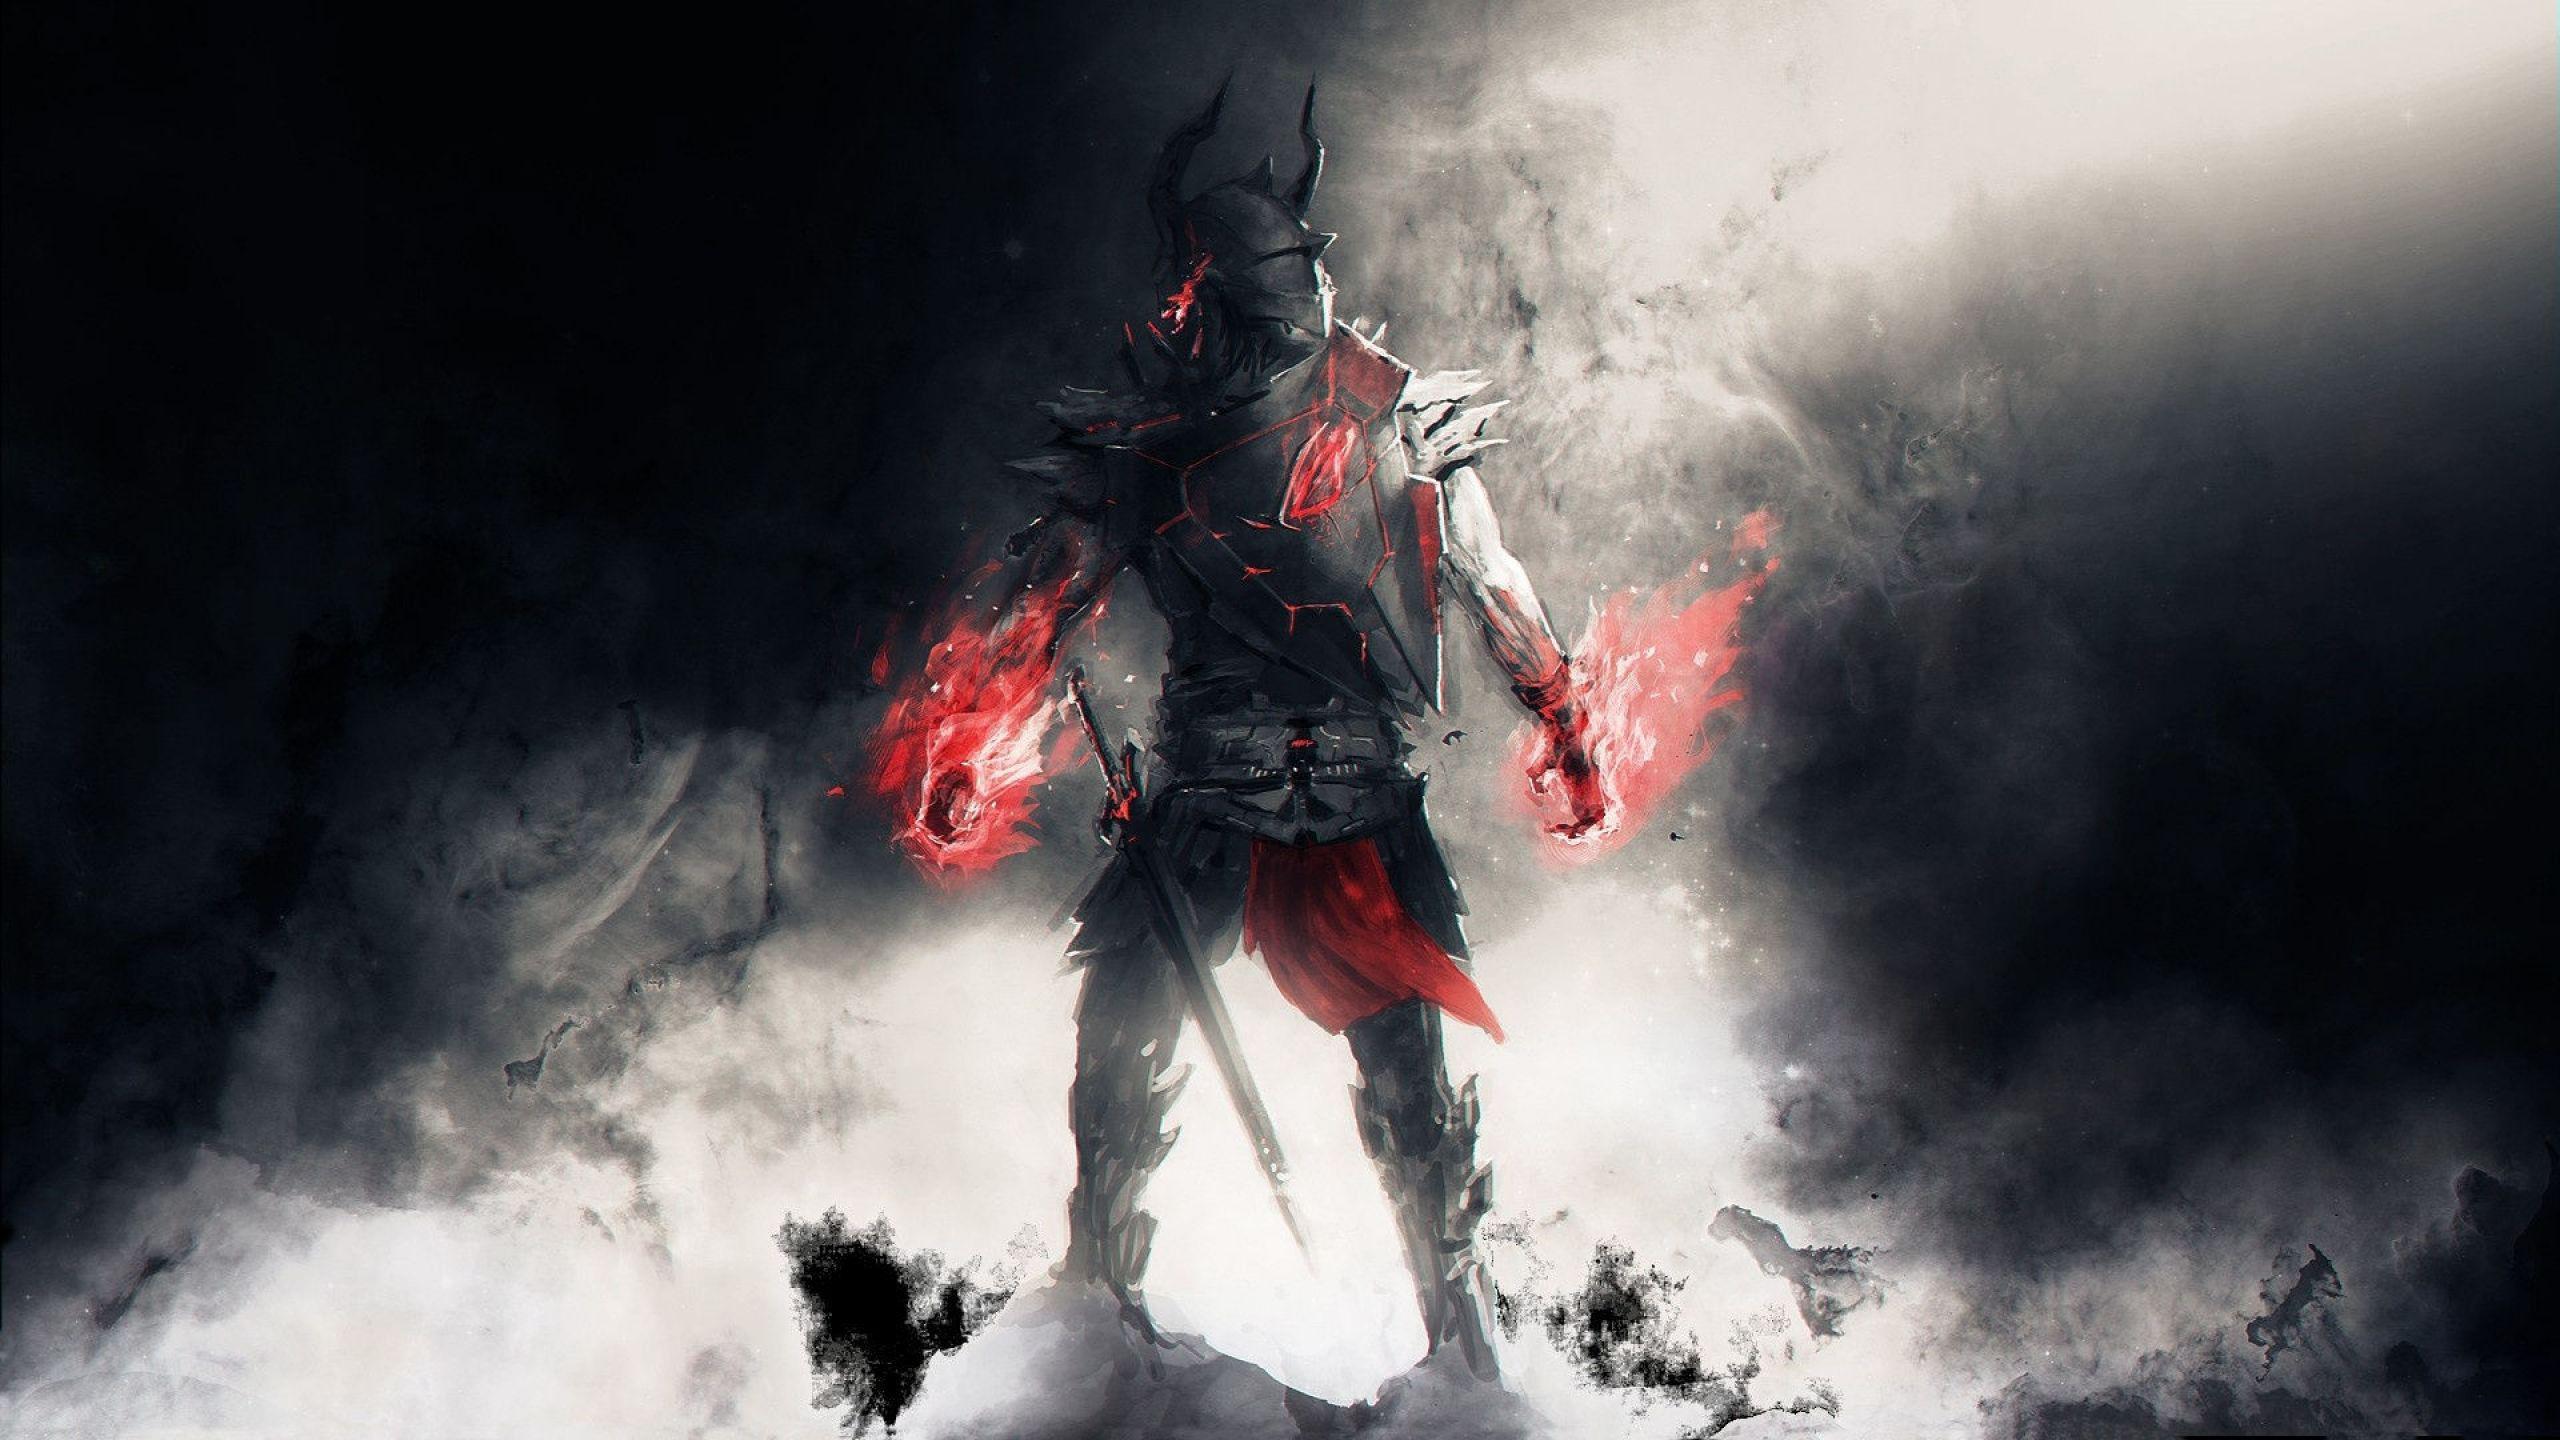 Skyrim Animated Wallpaper Hd Lords Fallen Fantasy Warrior Armor Sword Weapon Free